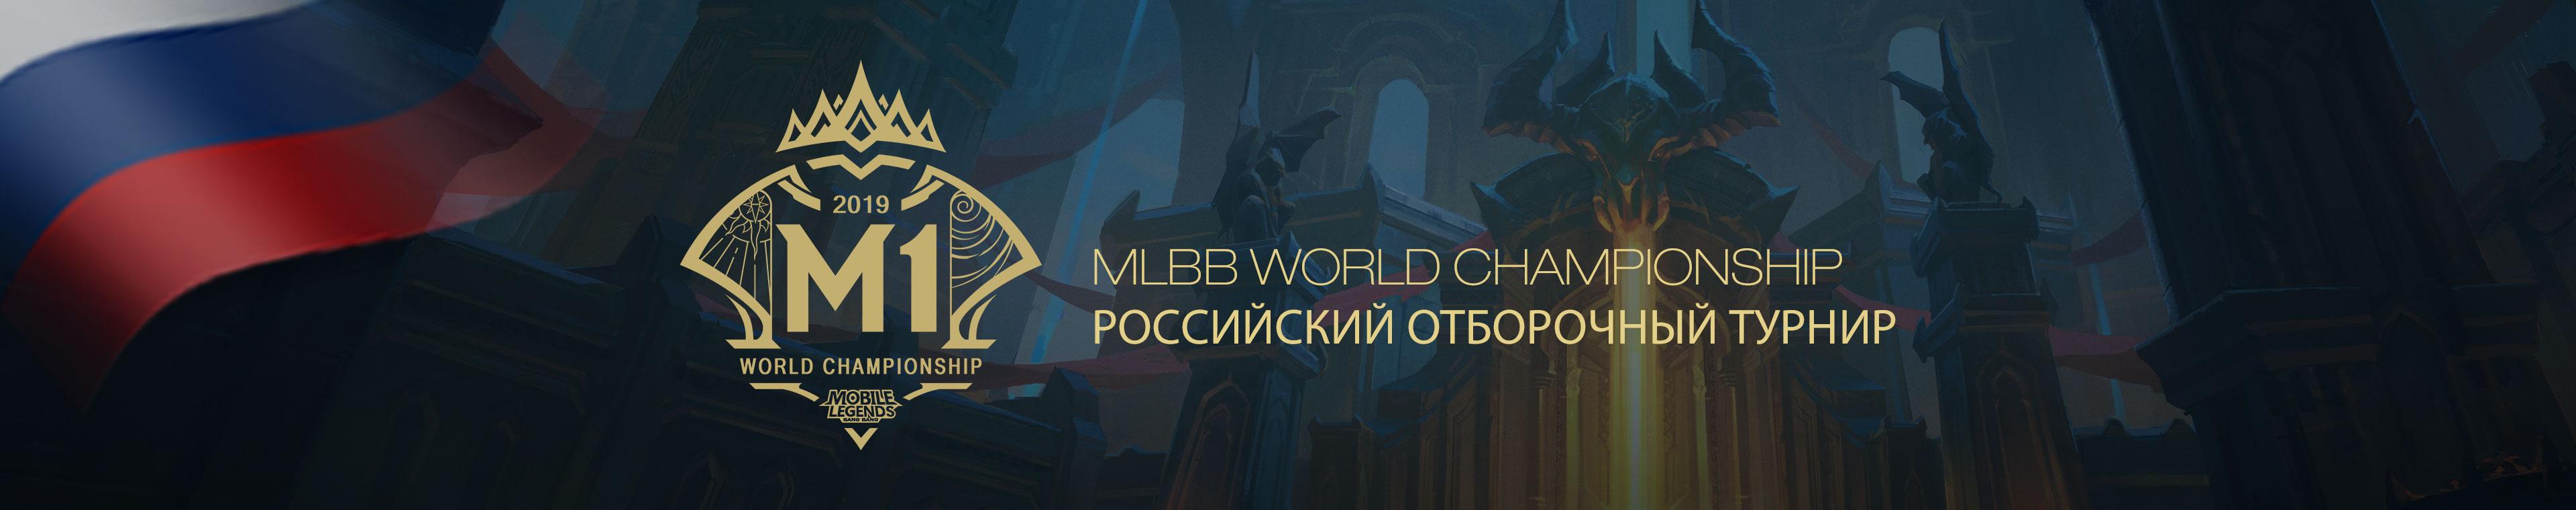 MLBB World Championship: Российский отборочный турнир